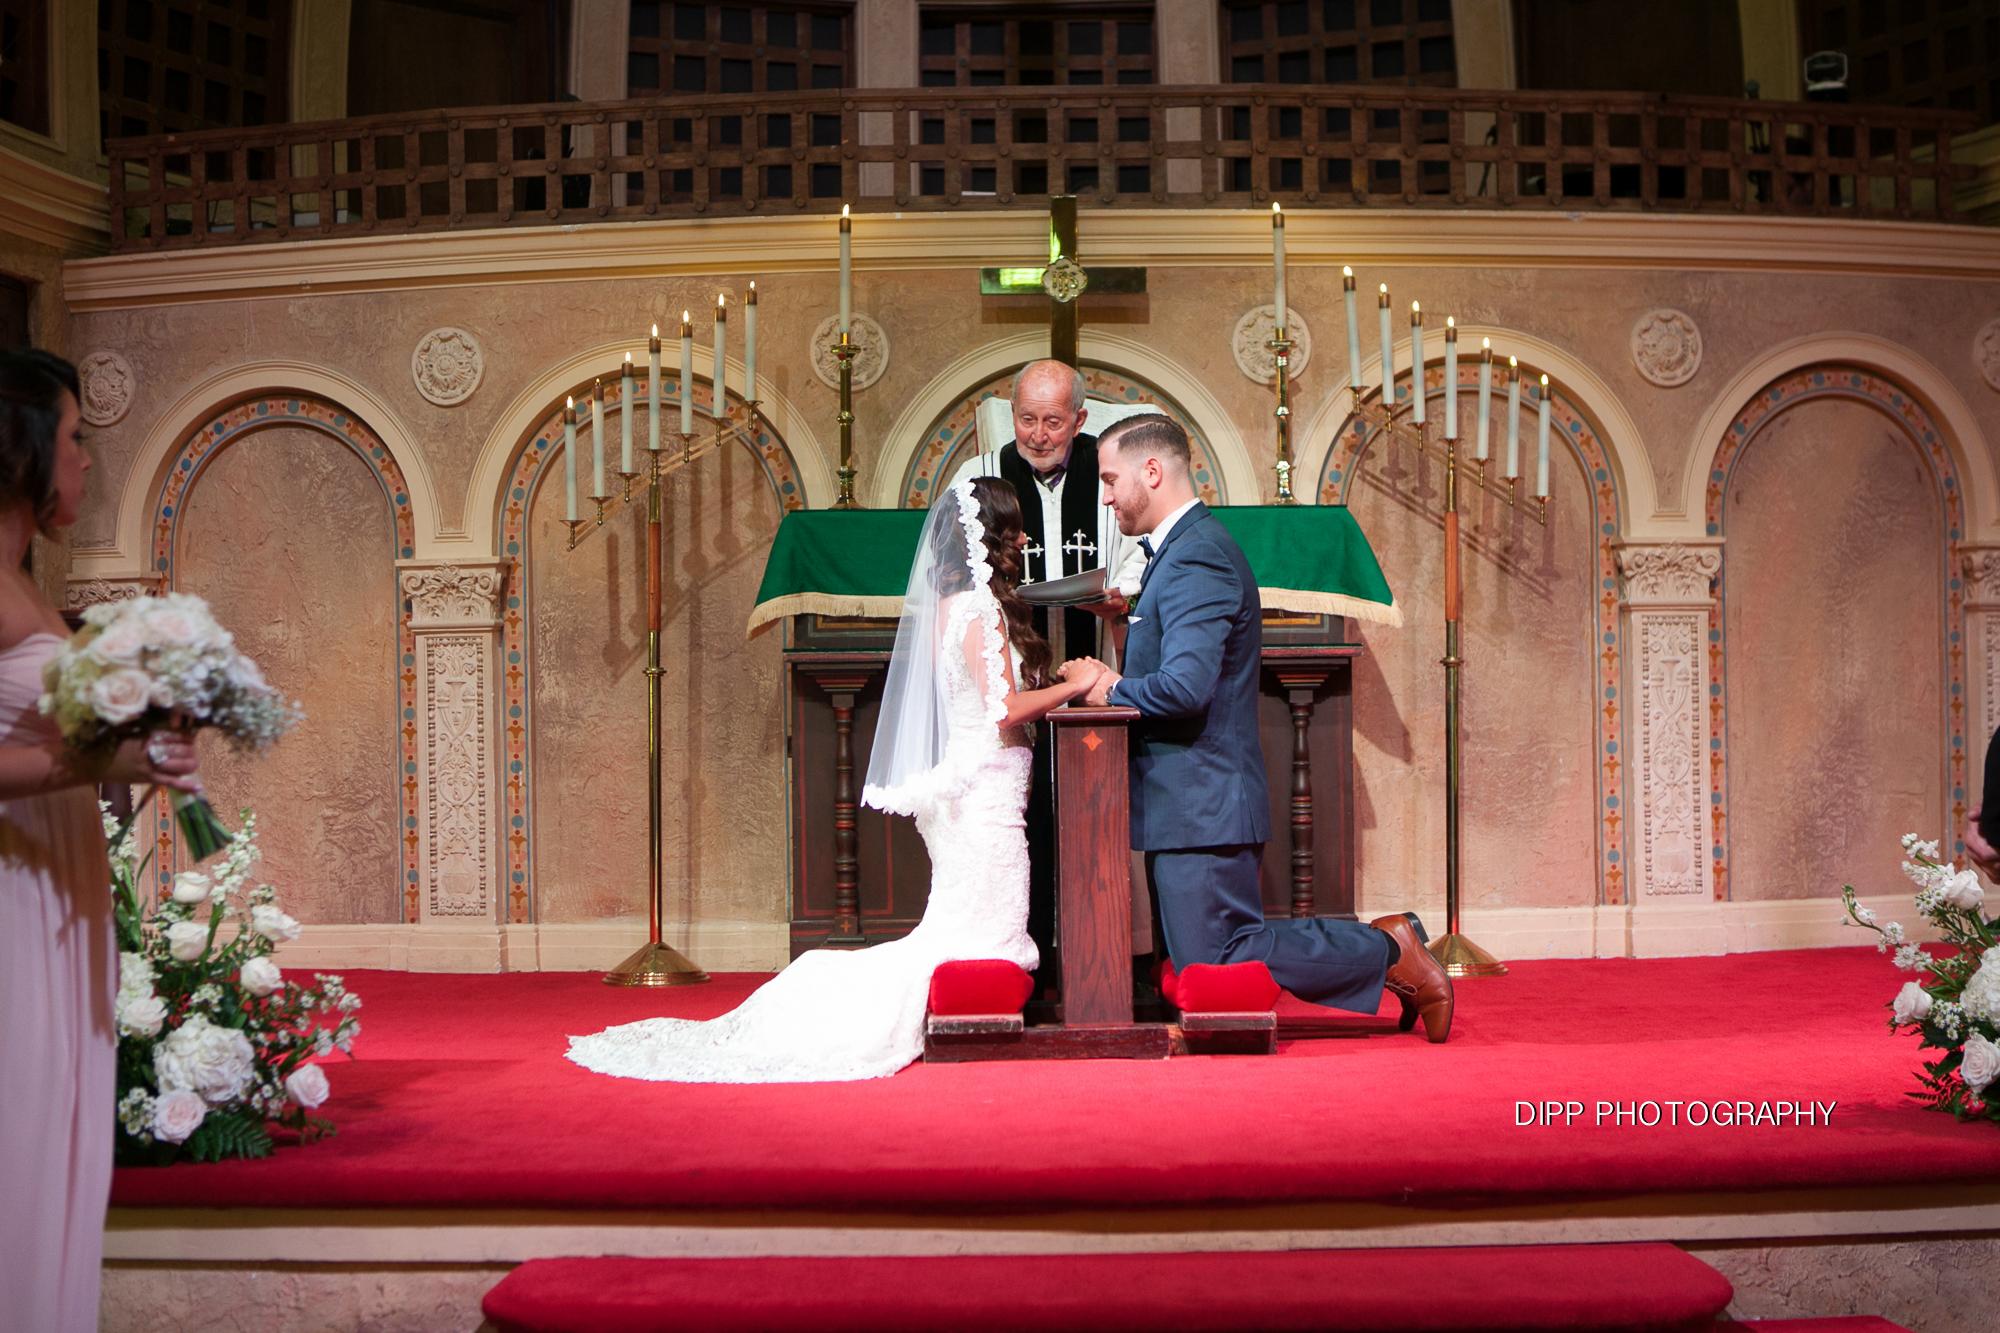 Dipp_2016 EDITED Melissa & Avilio Wedding-123